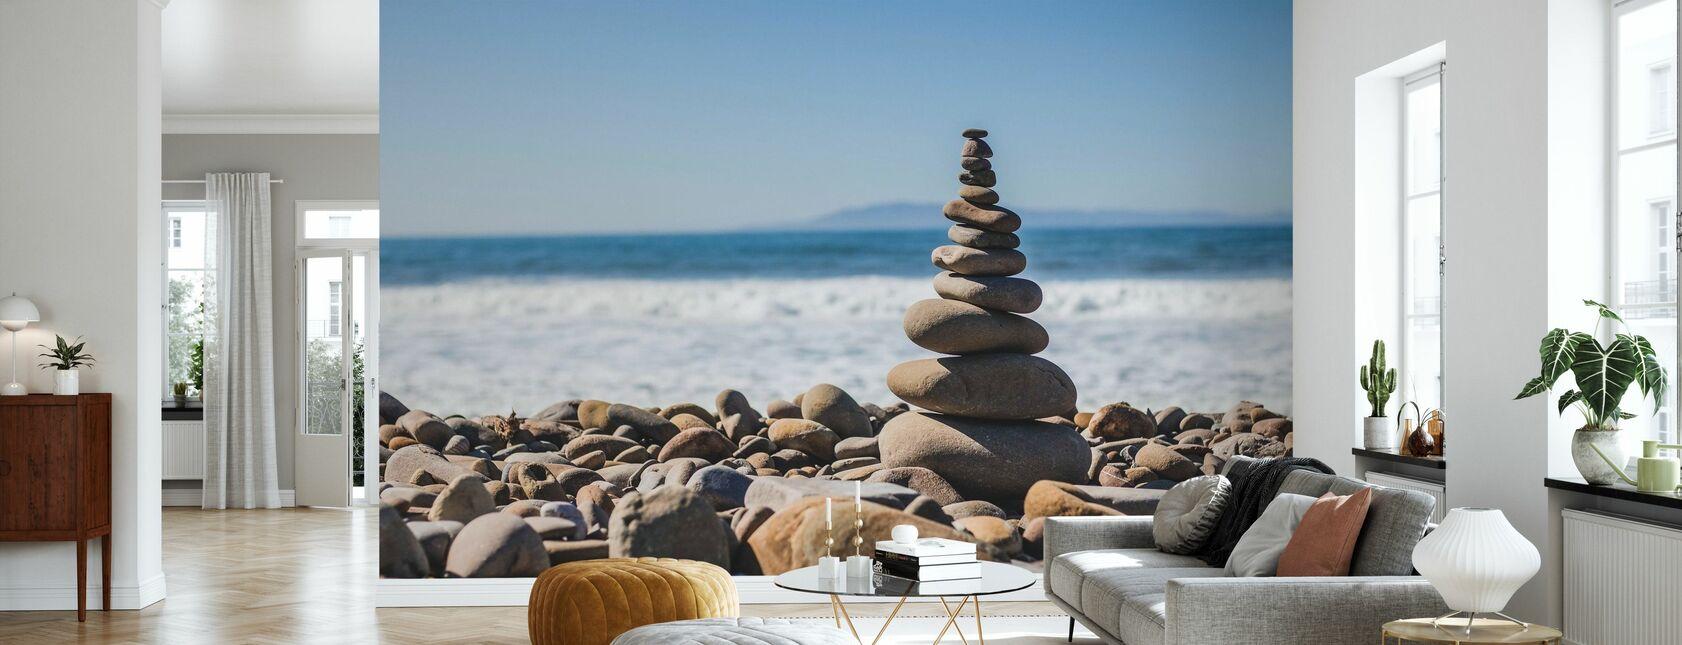 Pebble Tower - Wallpaper - Living Room